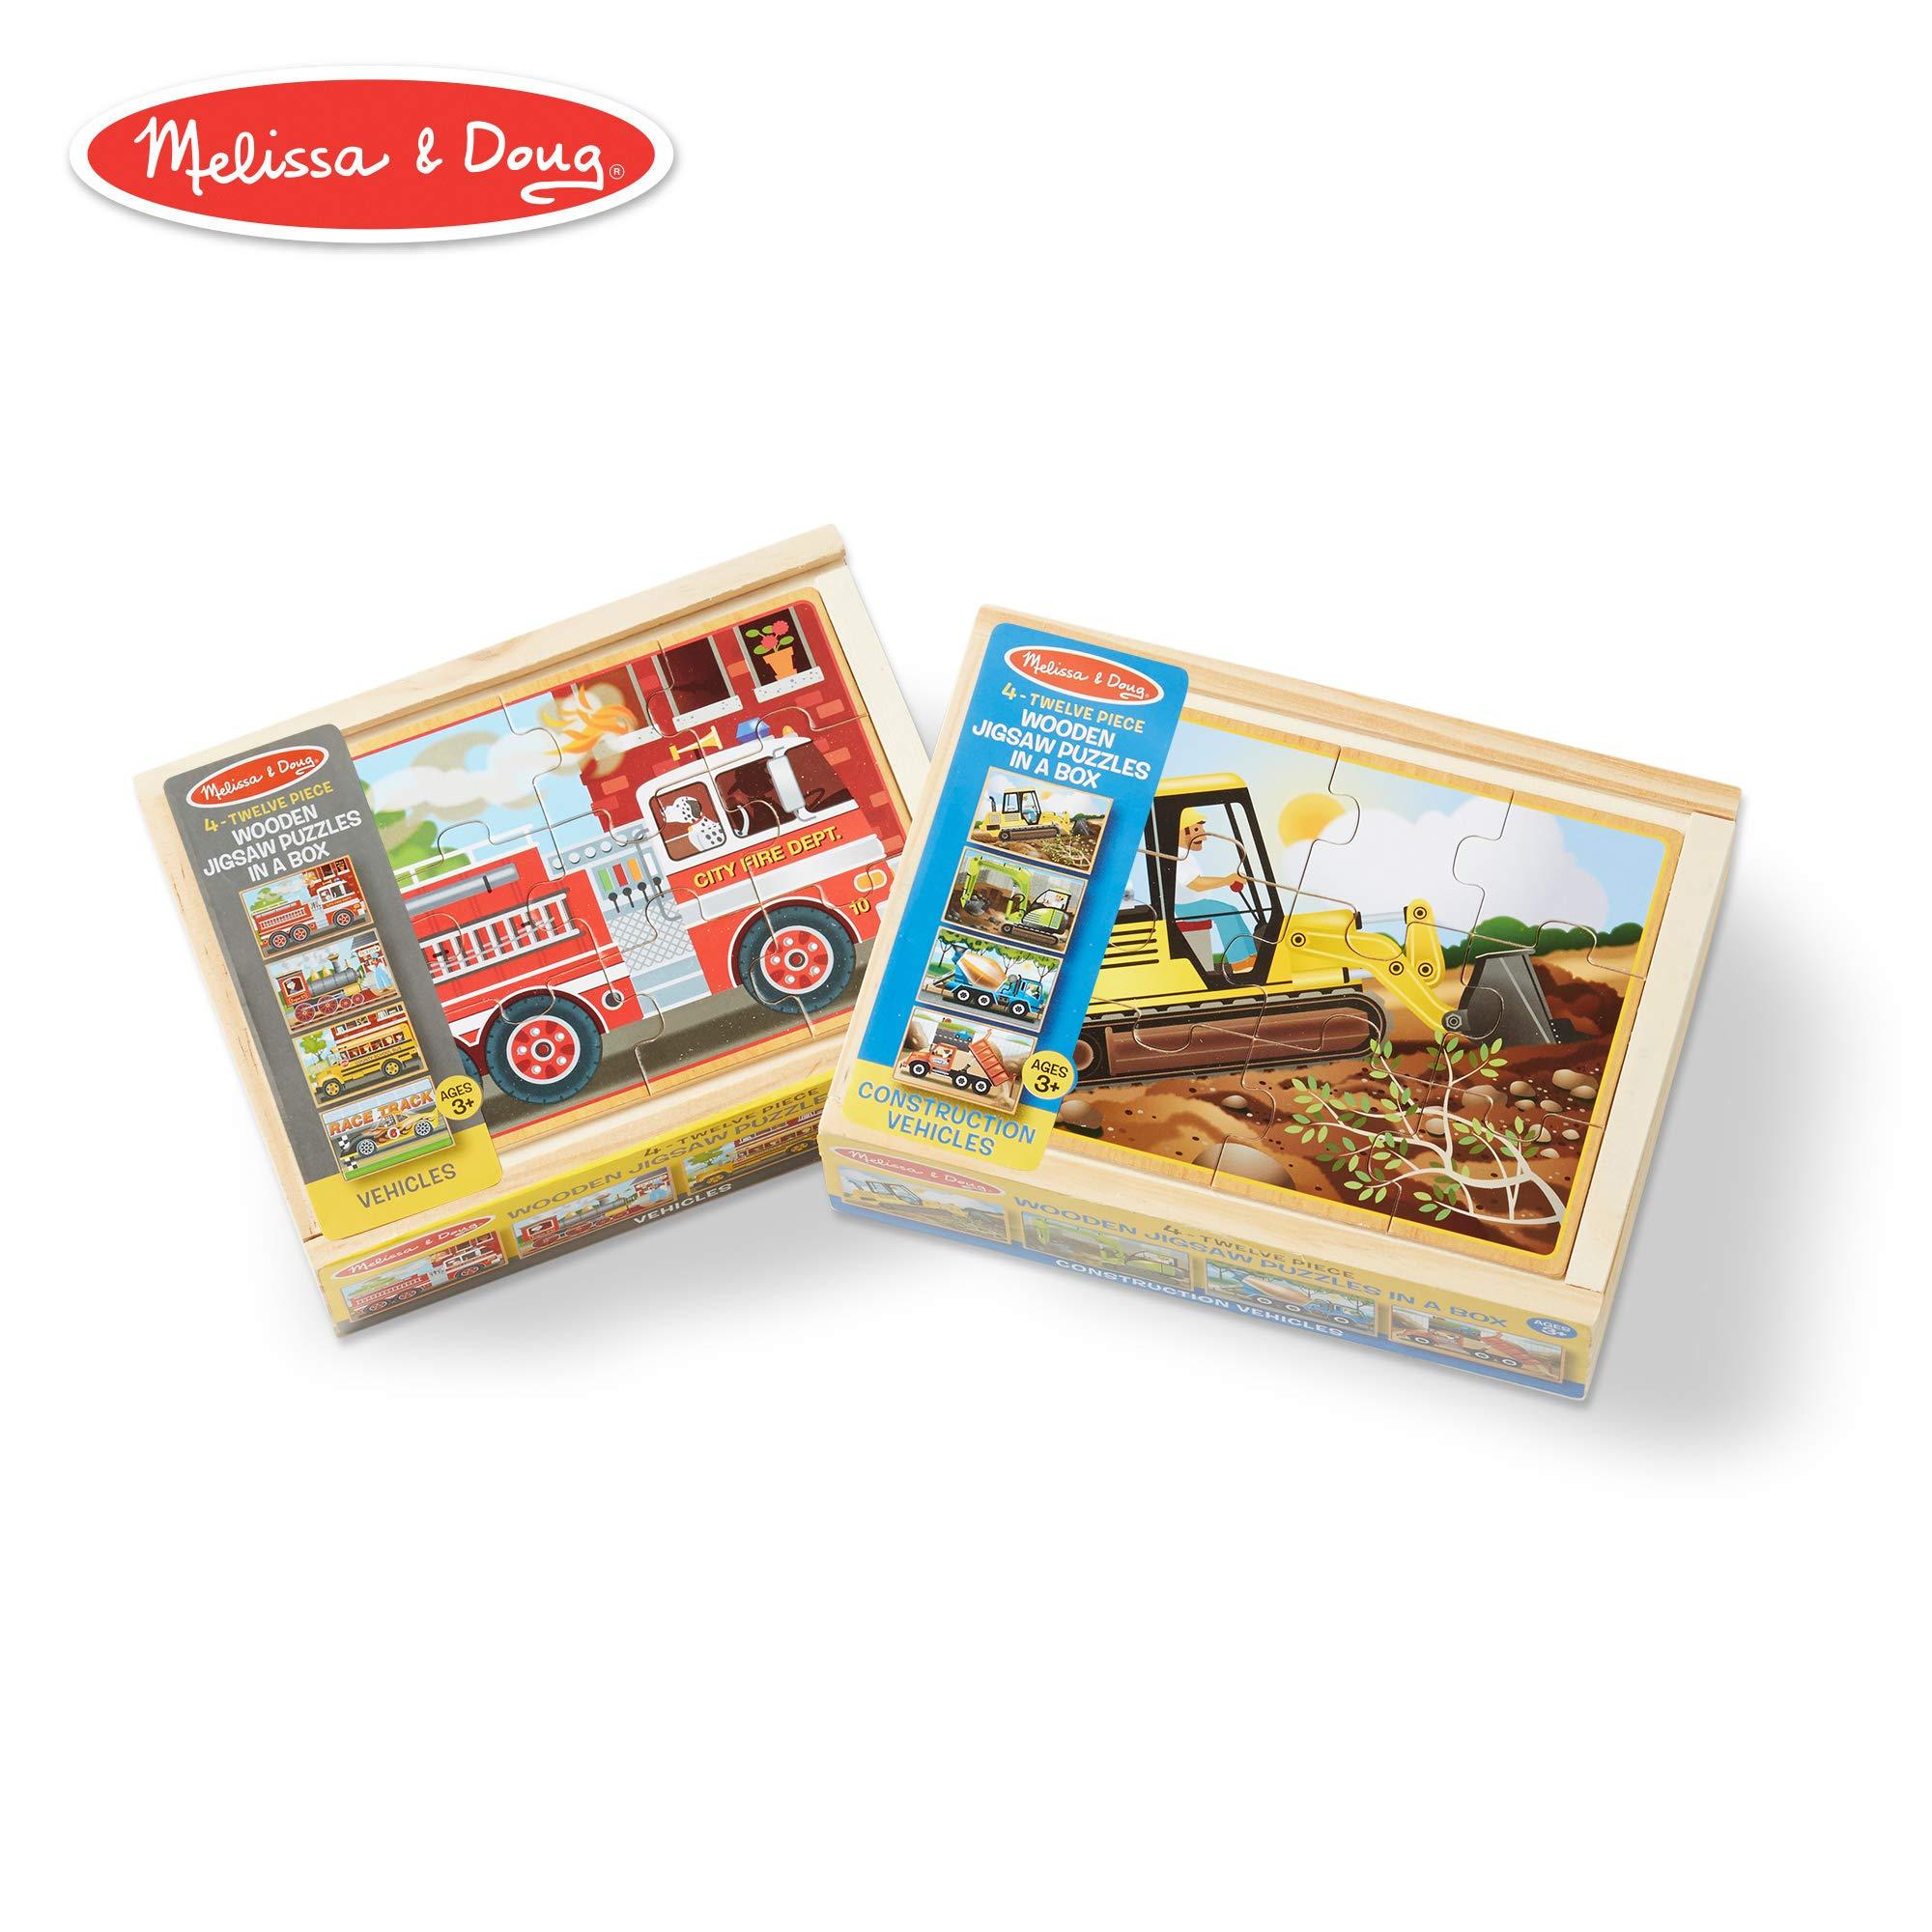 Melissa & Doug Wooden Jigsaw Puzzles Set: Vehicles and Construction by Melissa & Doug